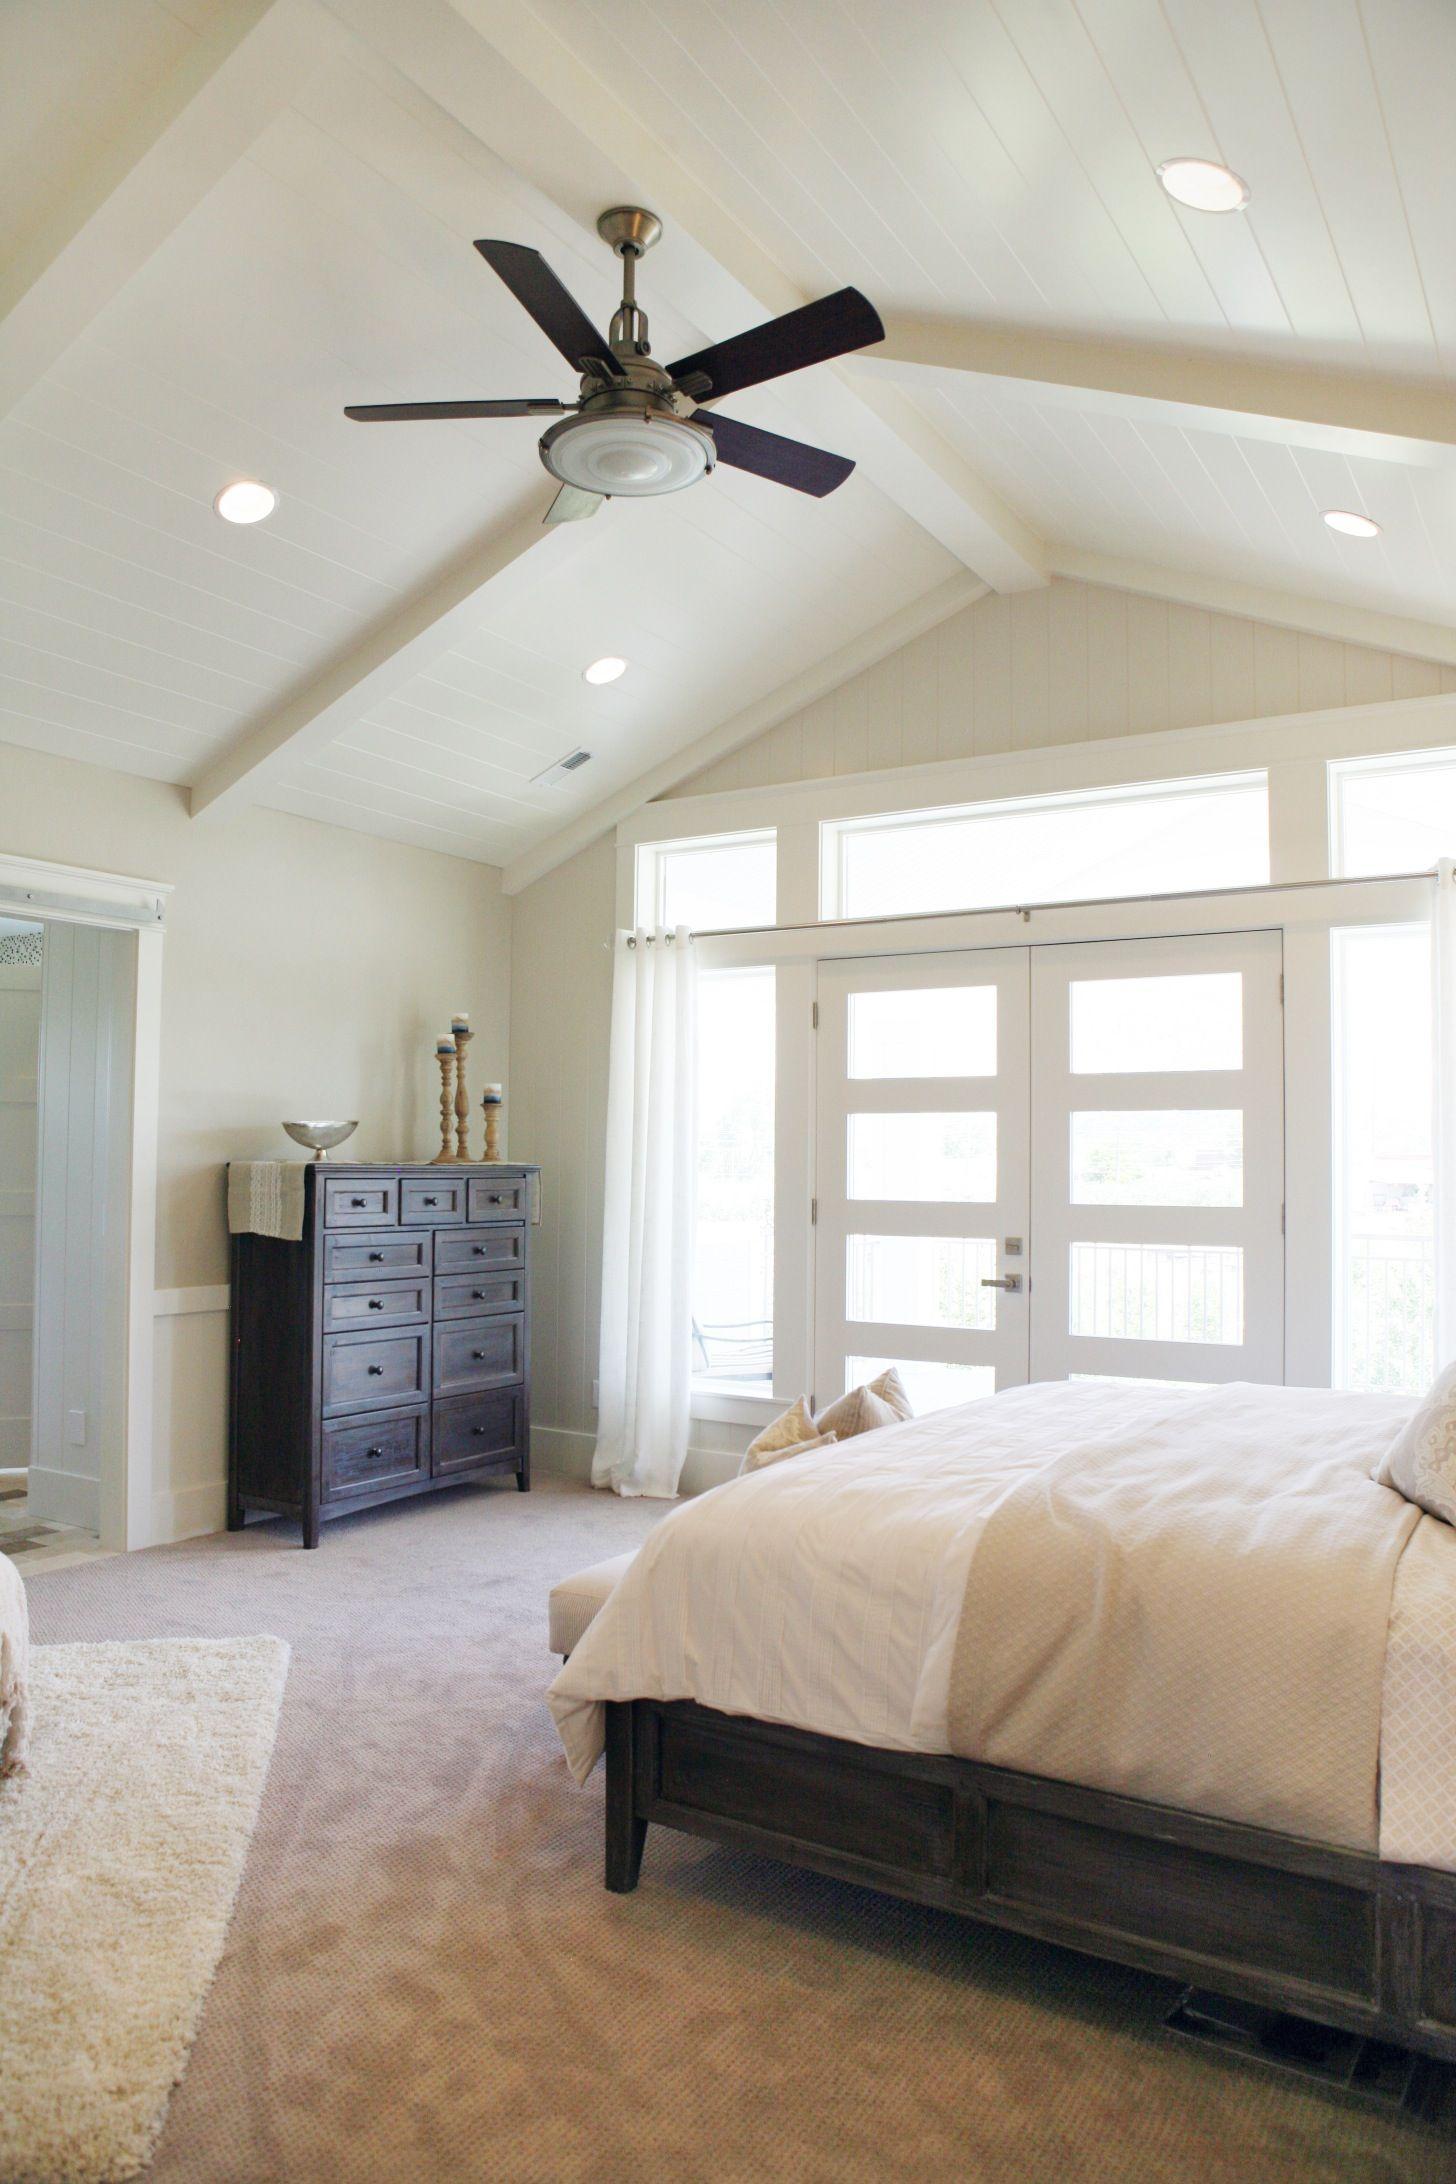 Bedroom Ceiling Lights For Low Ceilings In 2020 Bed In Living Room Vaulted Ceiling Bedroom Home Bedroom